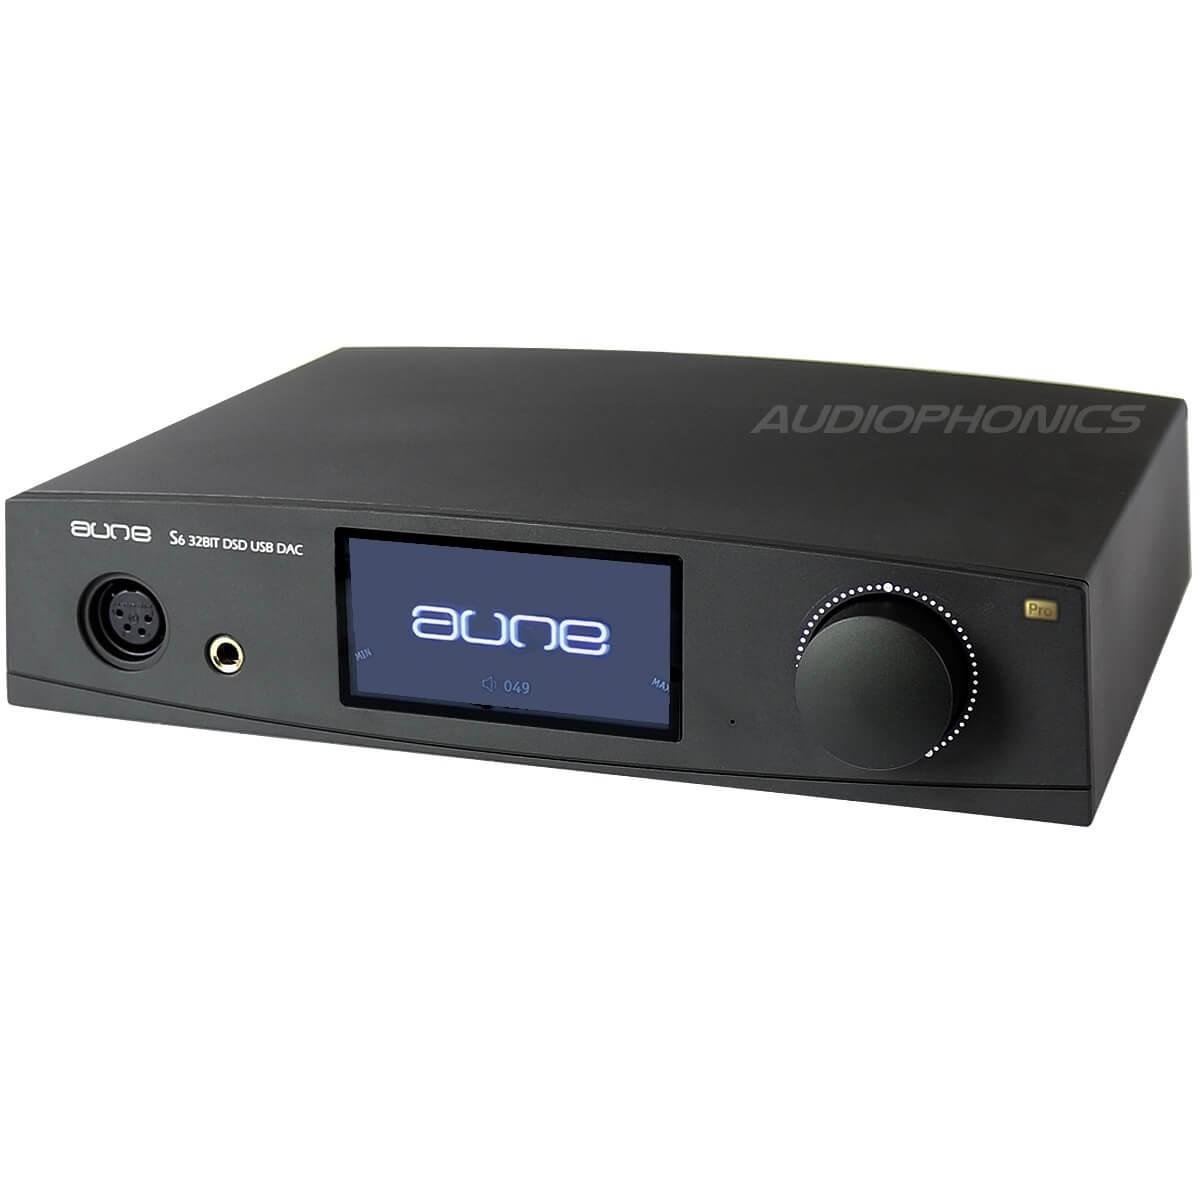 AUNE S6 PRO Headphonie amplifier XLR DAC DSD / DXD AK4497 32bit / 768kHz XMOS Black